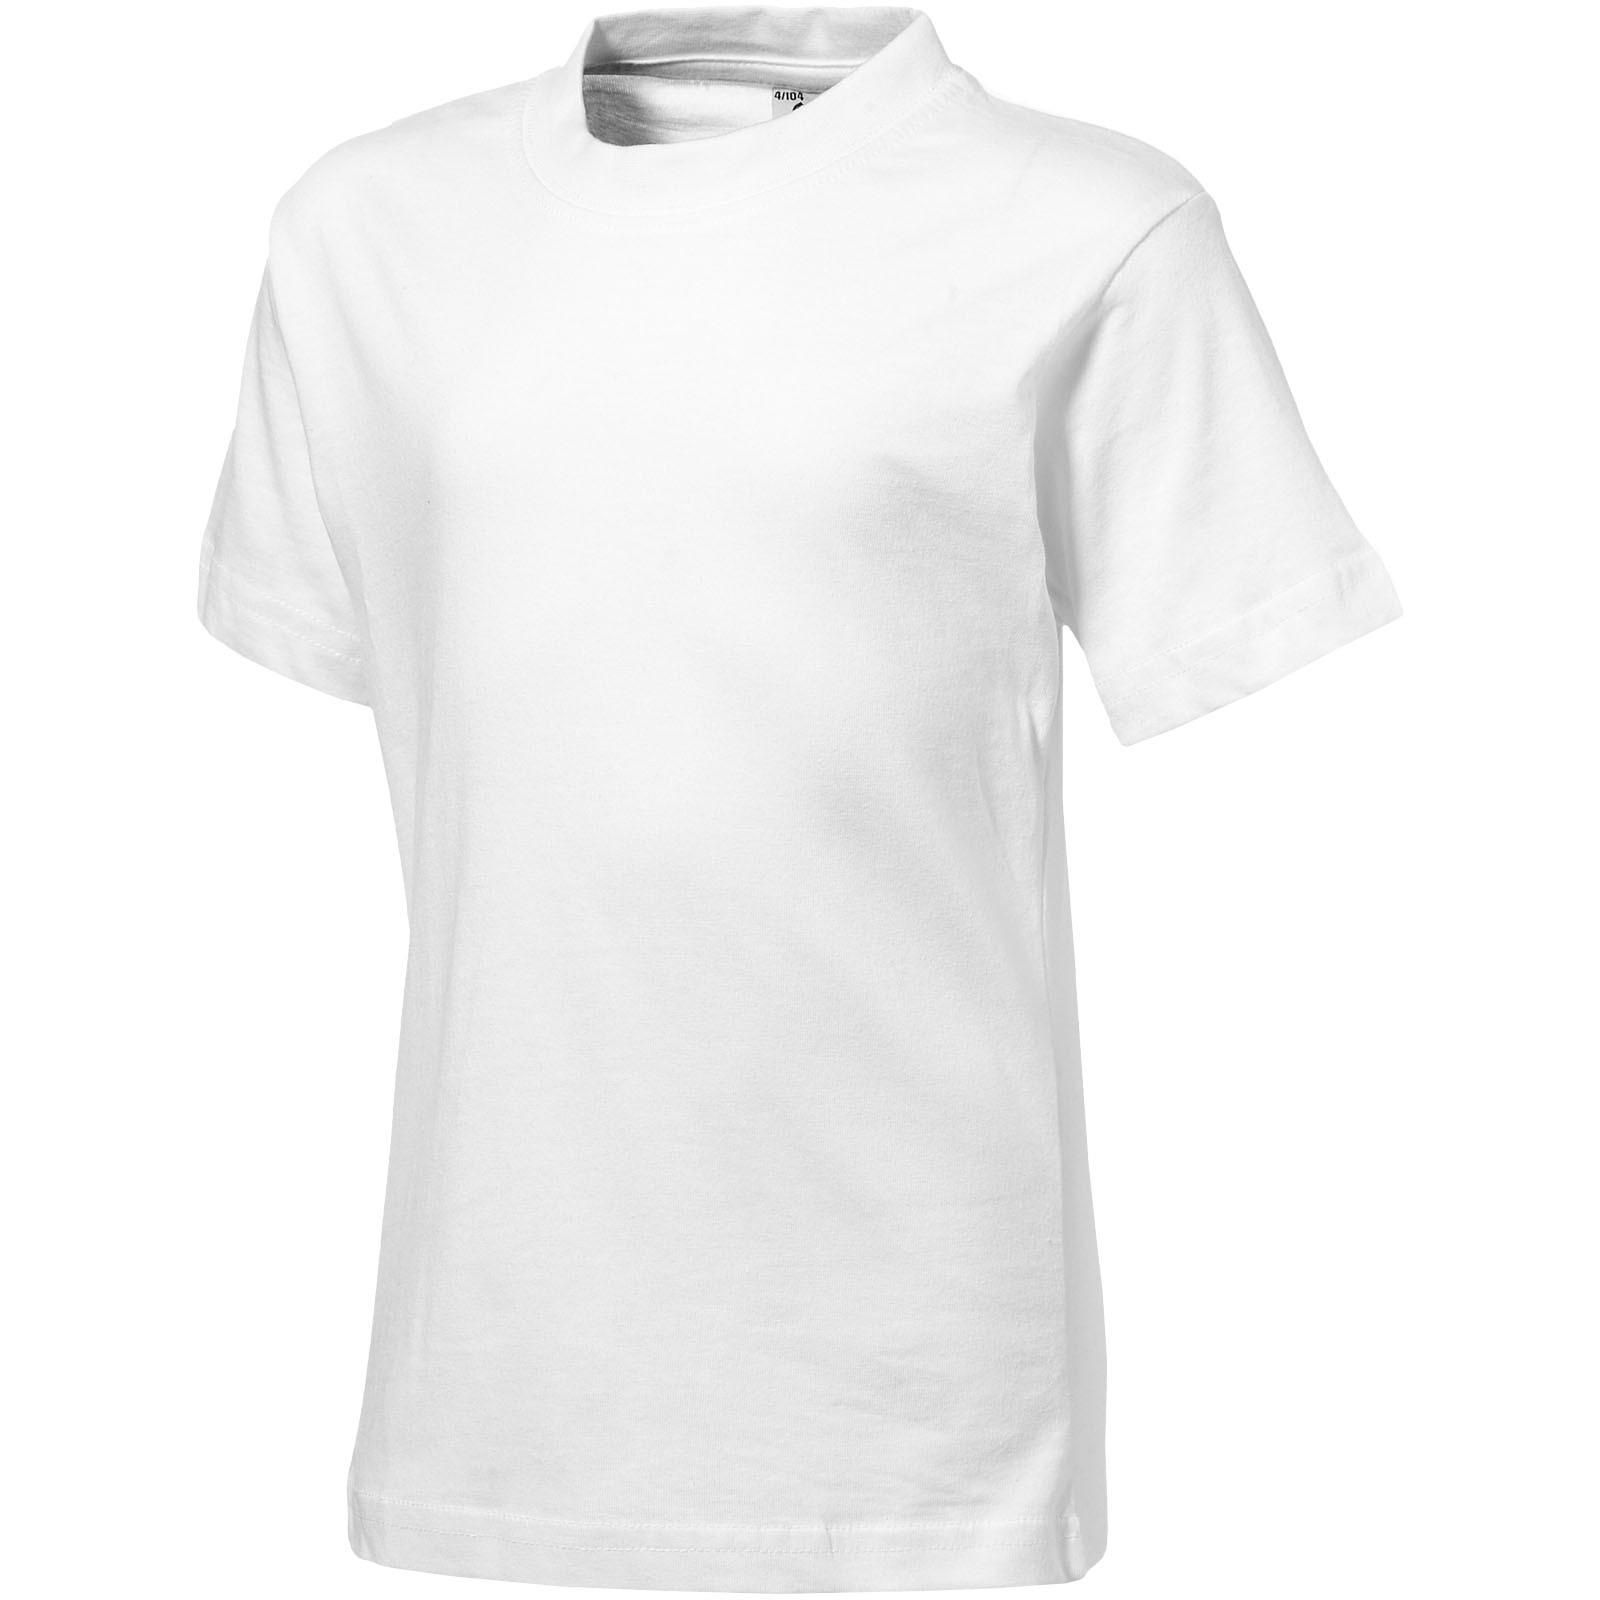 Ace short sleeve kids t-shirt - White / 128